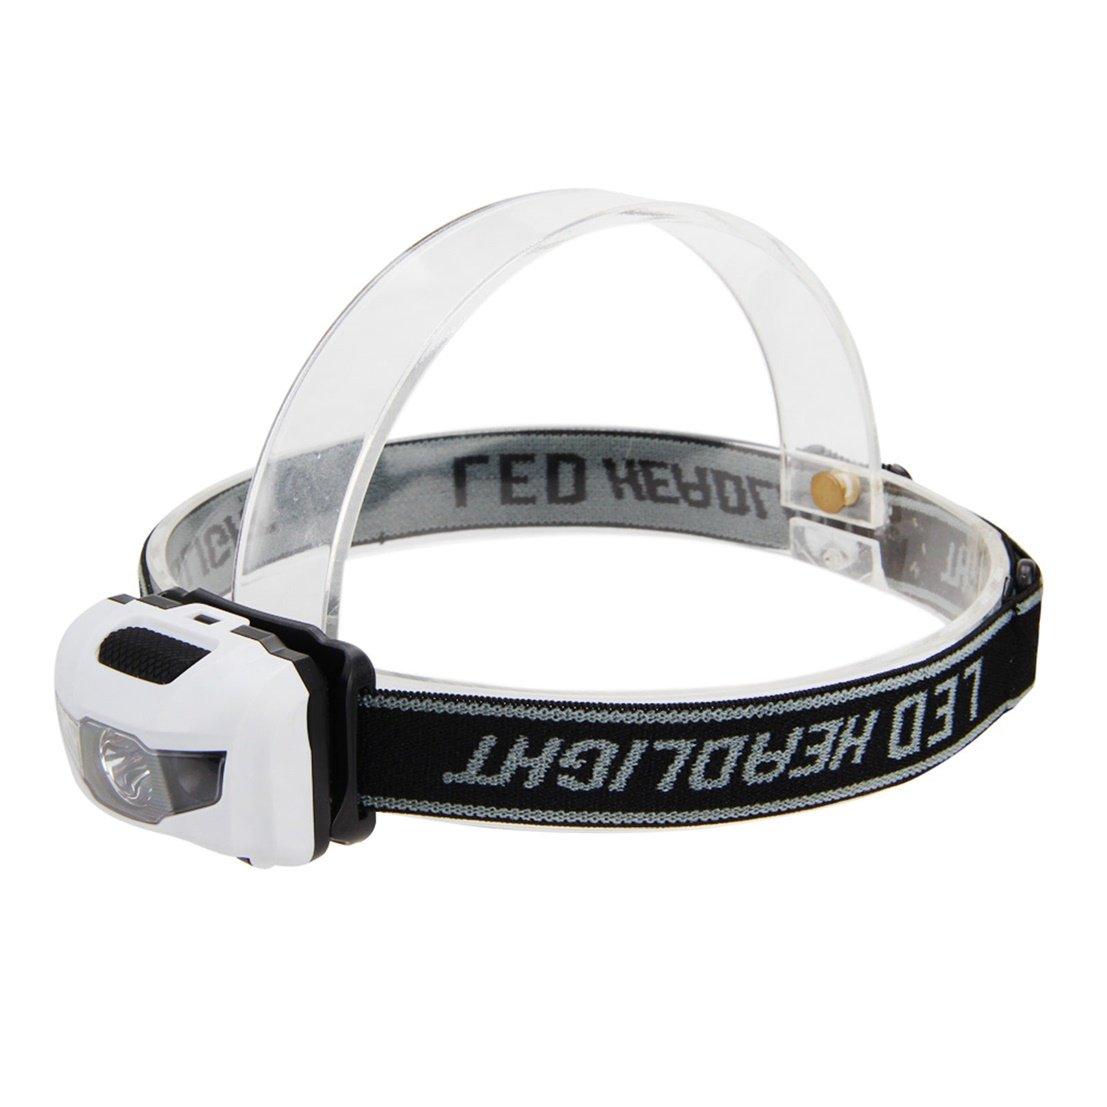 1 Pc Professional Popular Mini LED 300 Lumens Headlamp Fishing Flashlight Bike Torch Waterproof Colors White and Black